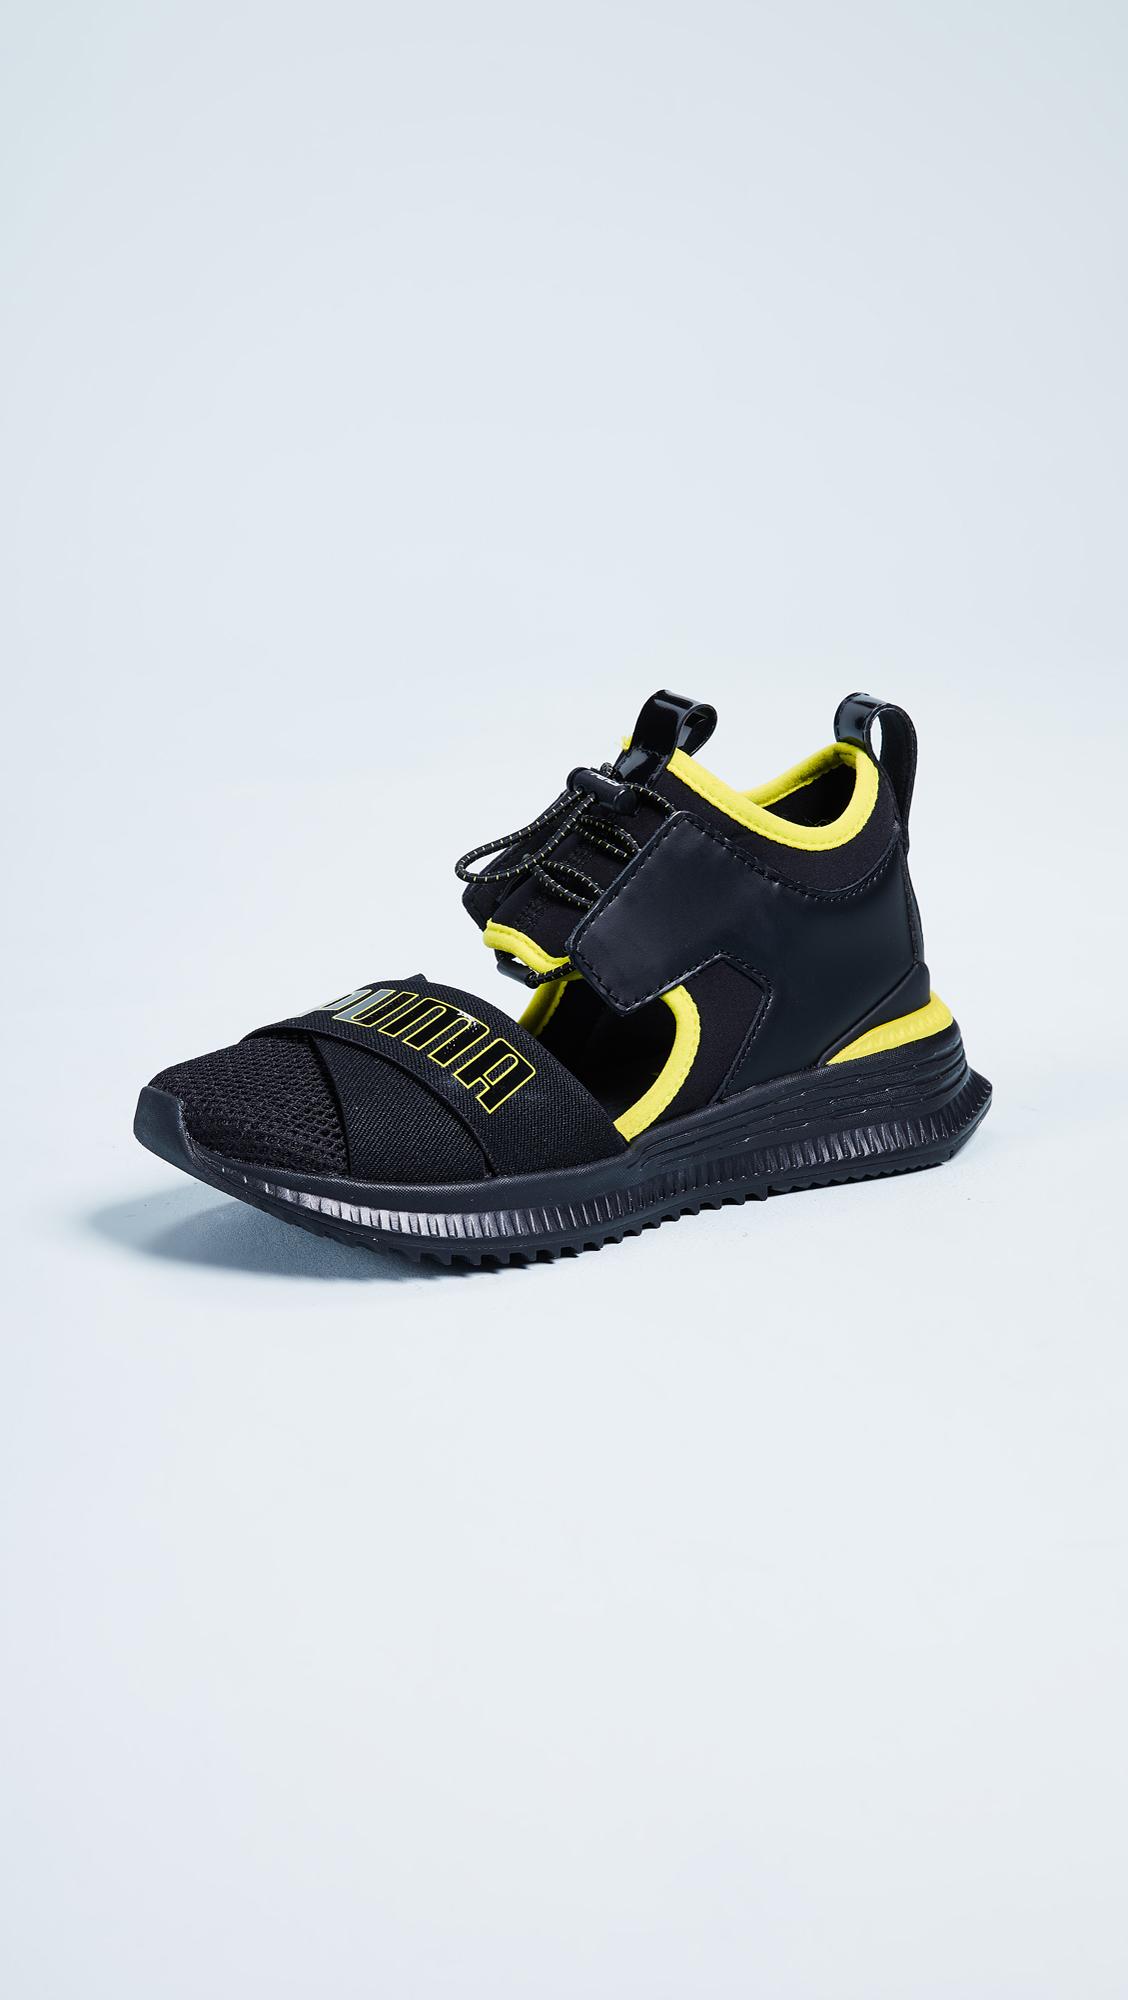 PUMA x FENTY Avid Sneakers - Puma Black/Limepunch/Black